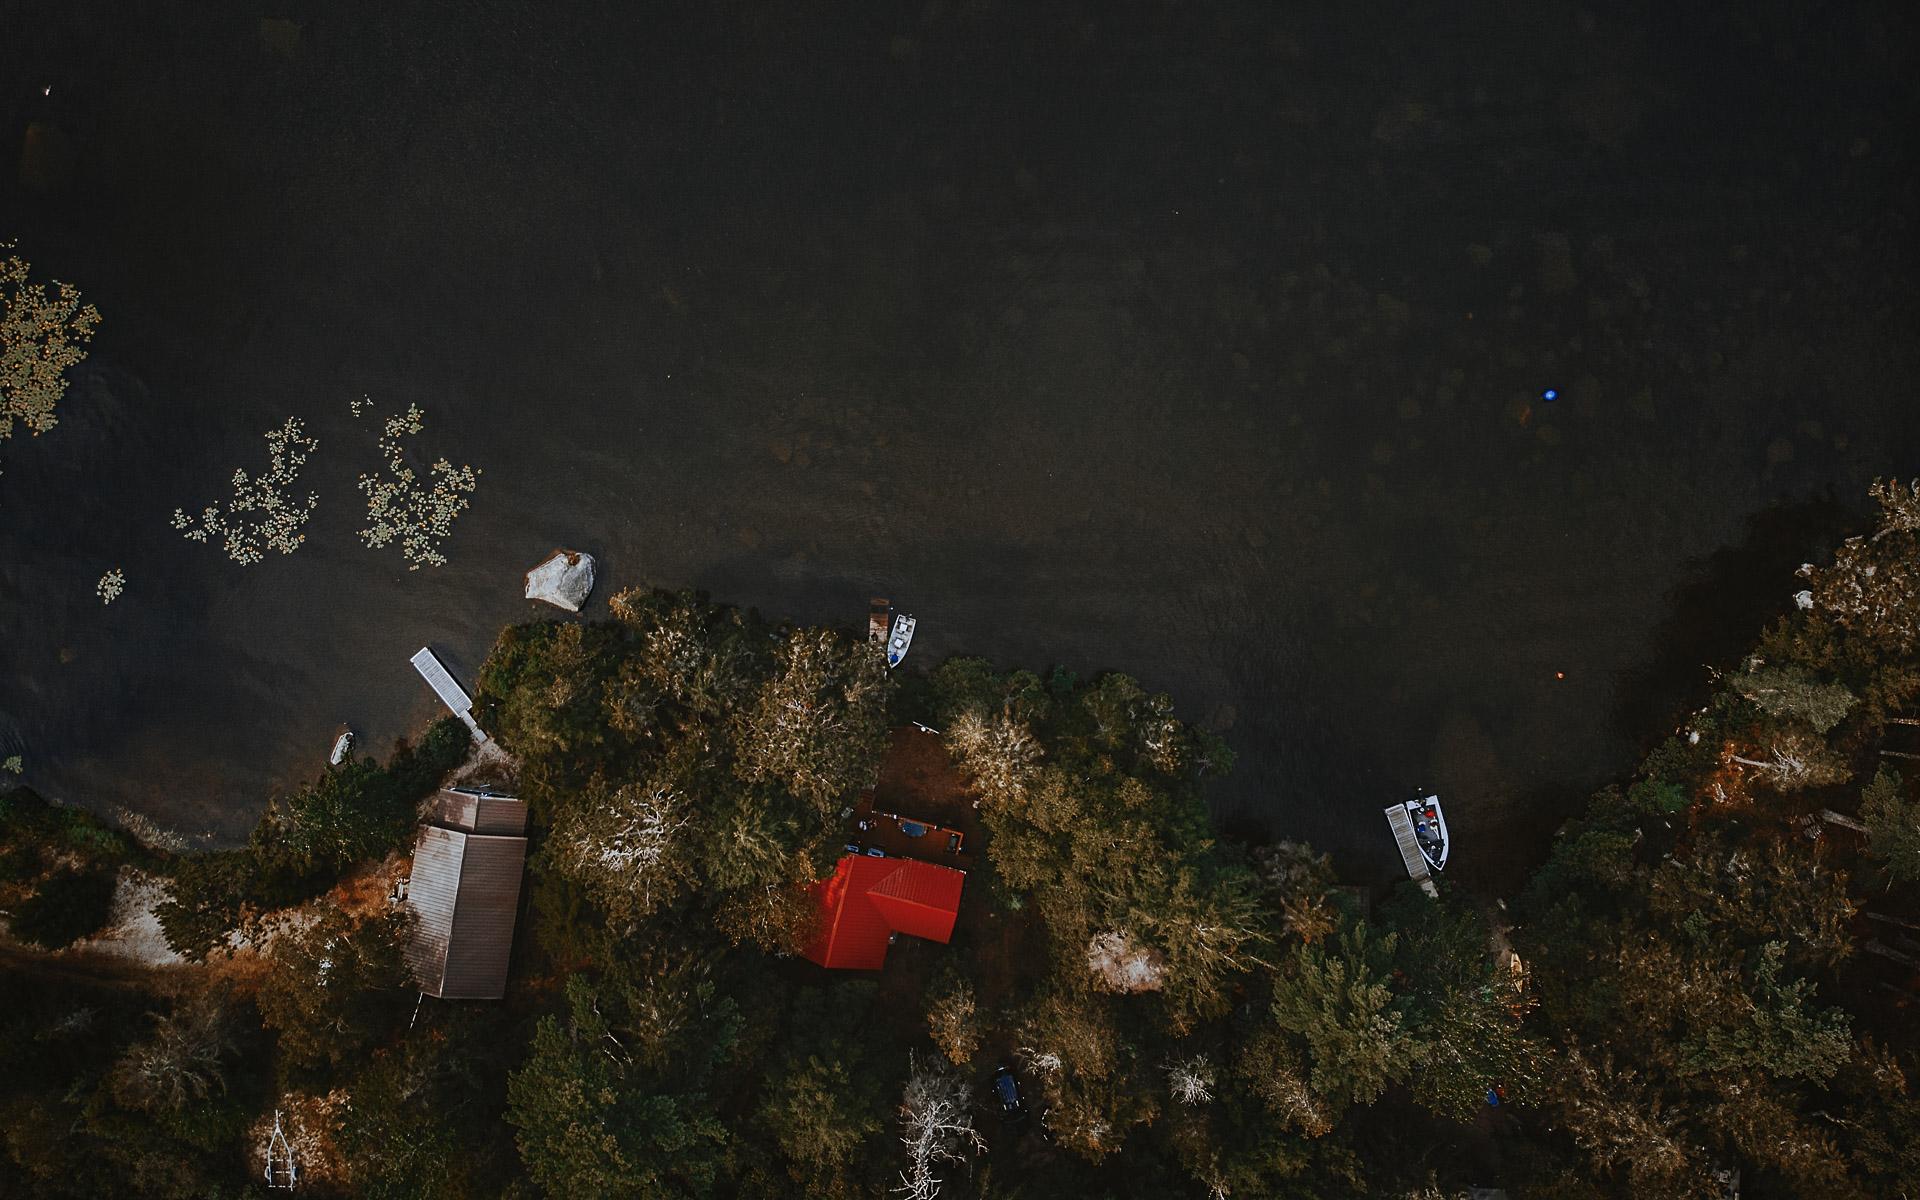 Twisted-oaks-studio-maine-bar-harbor-2019-78.jpg